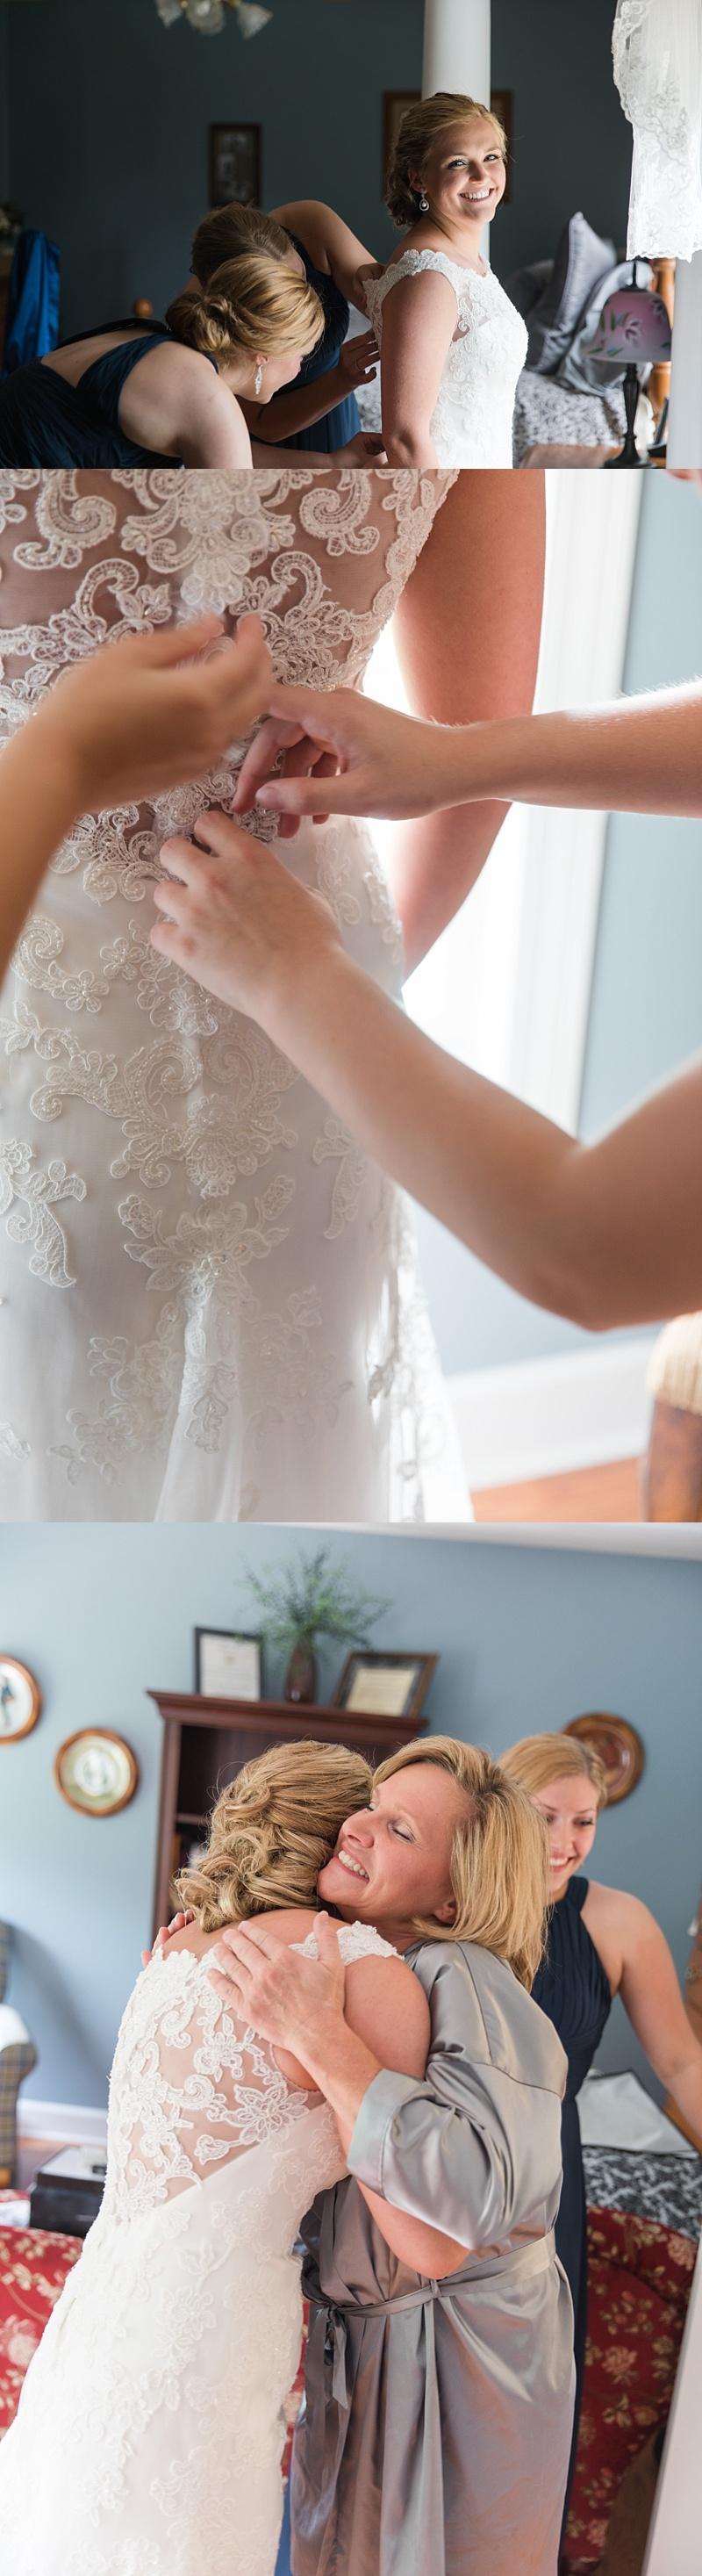 Katie Troll Wedding Day